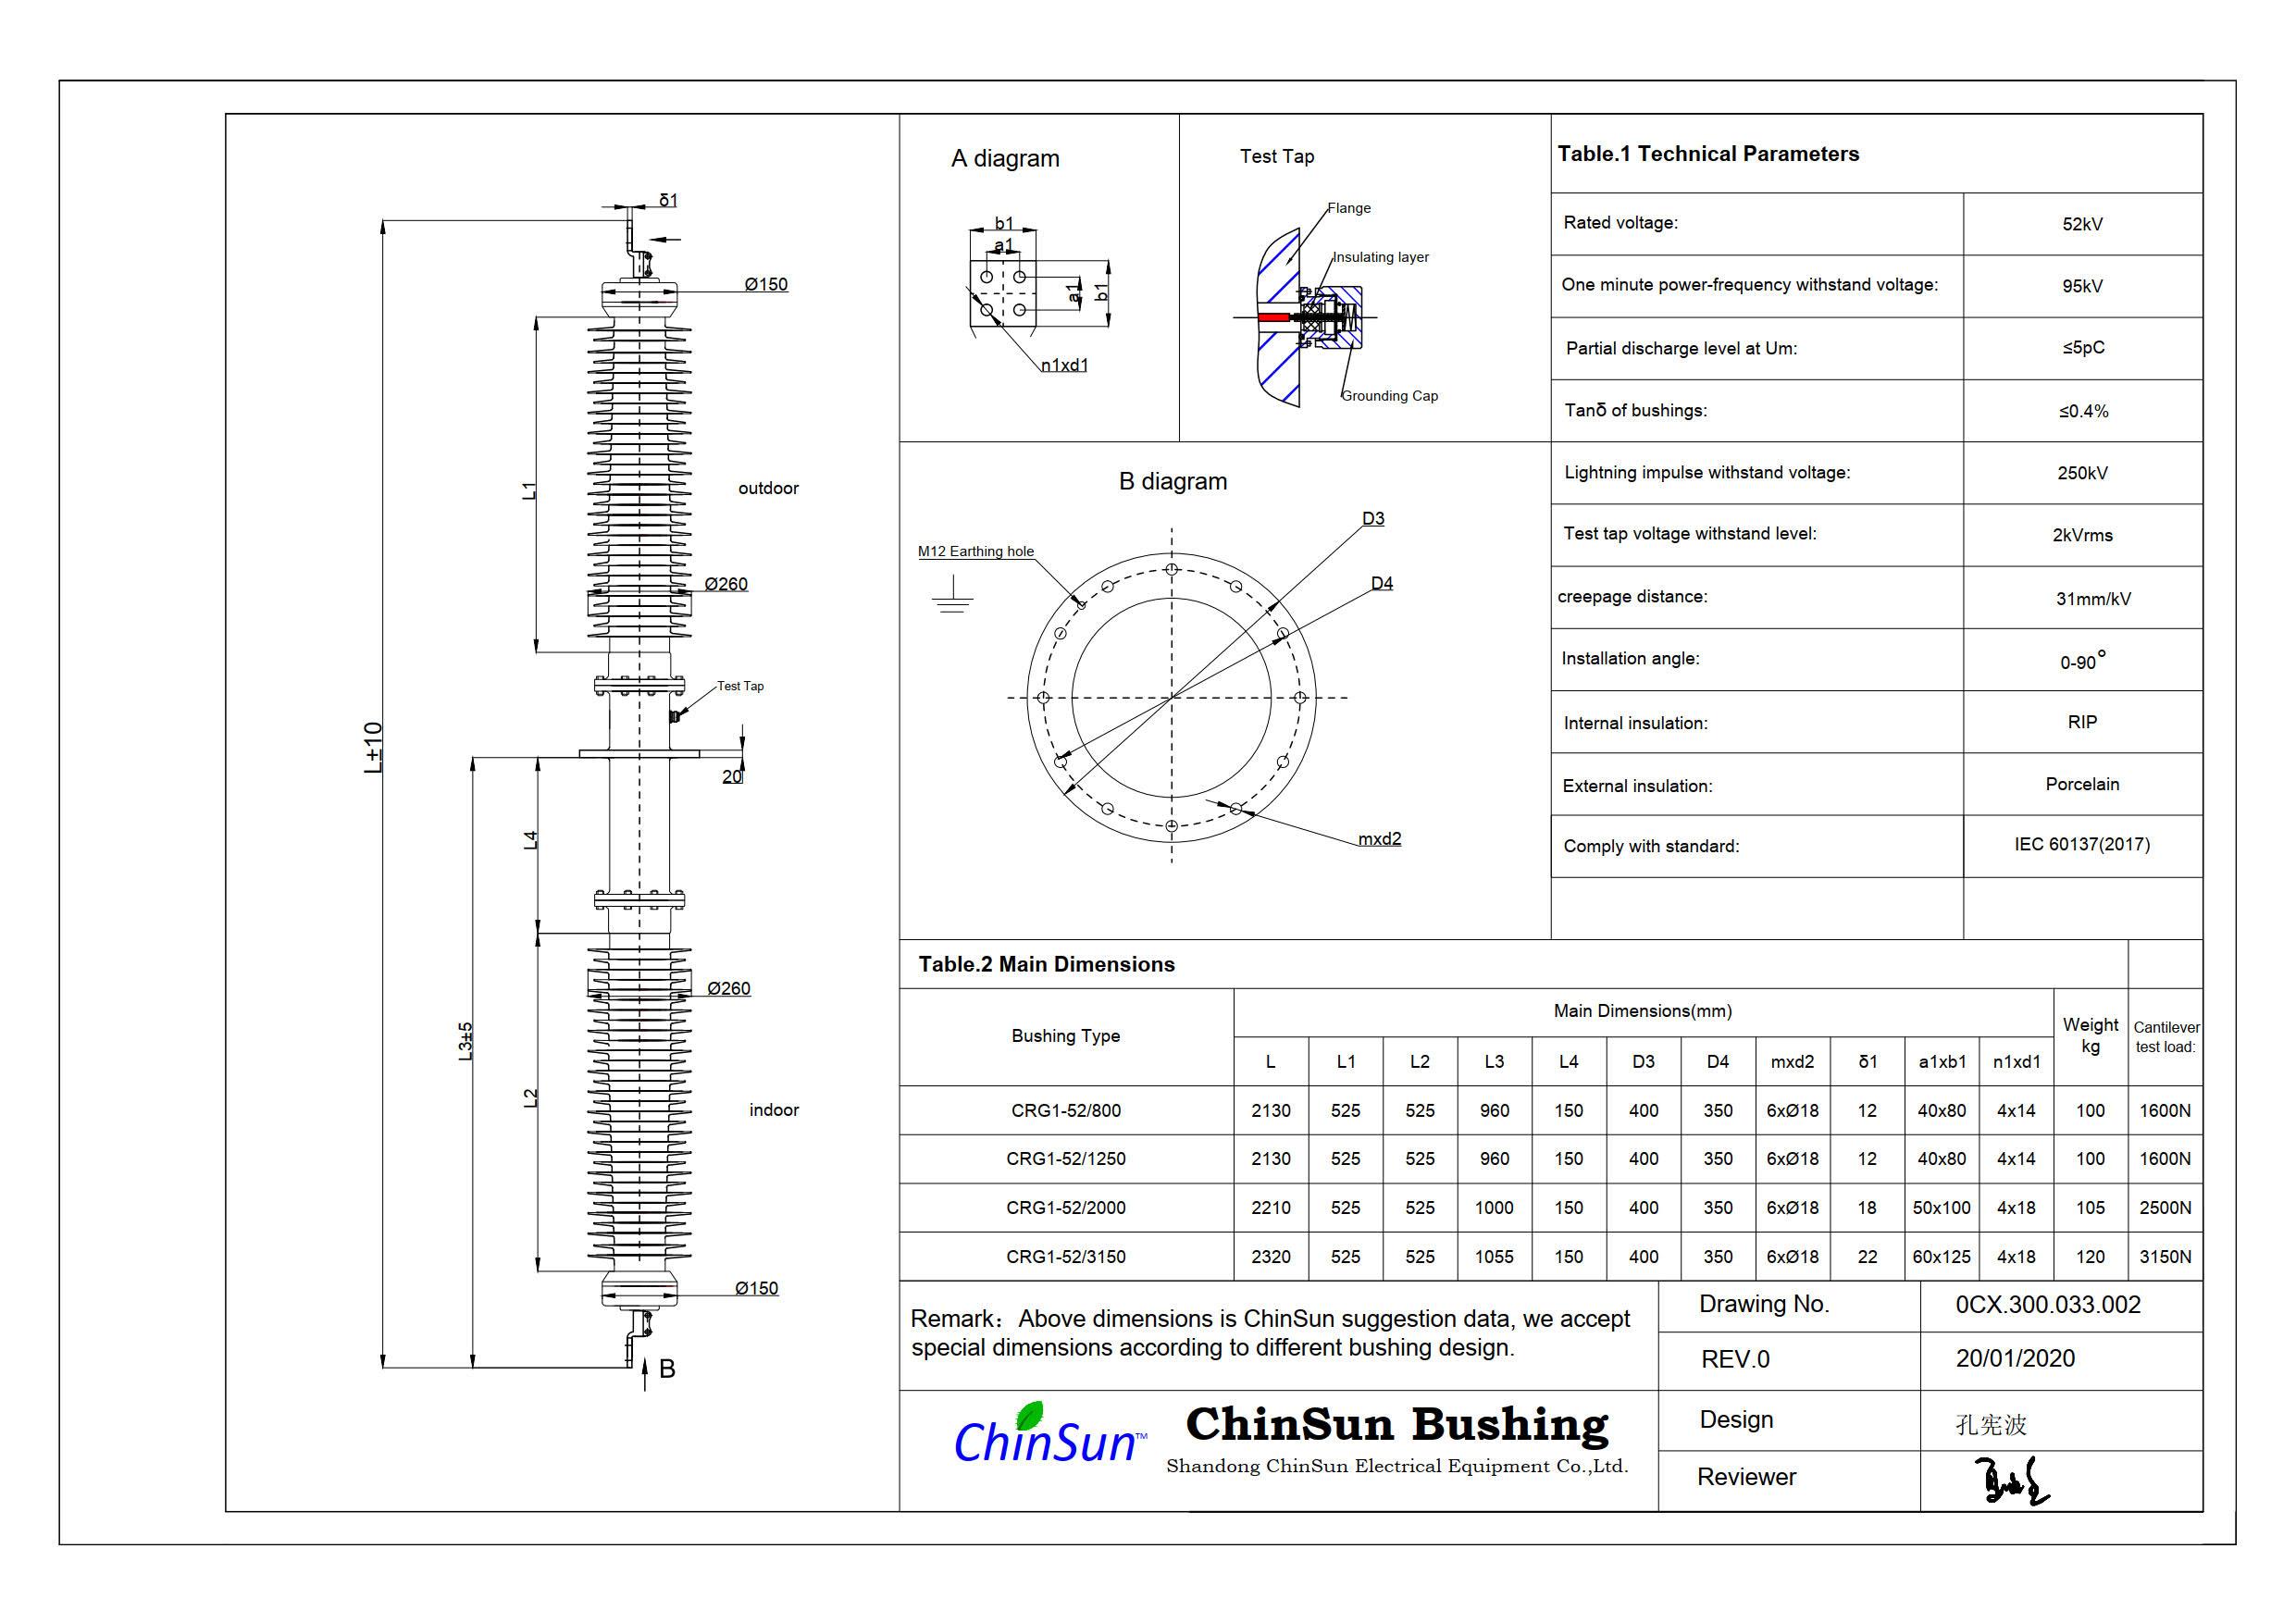 Drawing-wall bushing-52kV porcelain-ChinSun